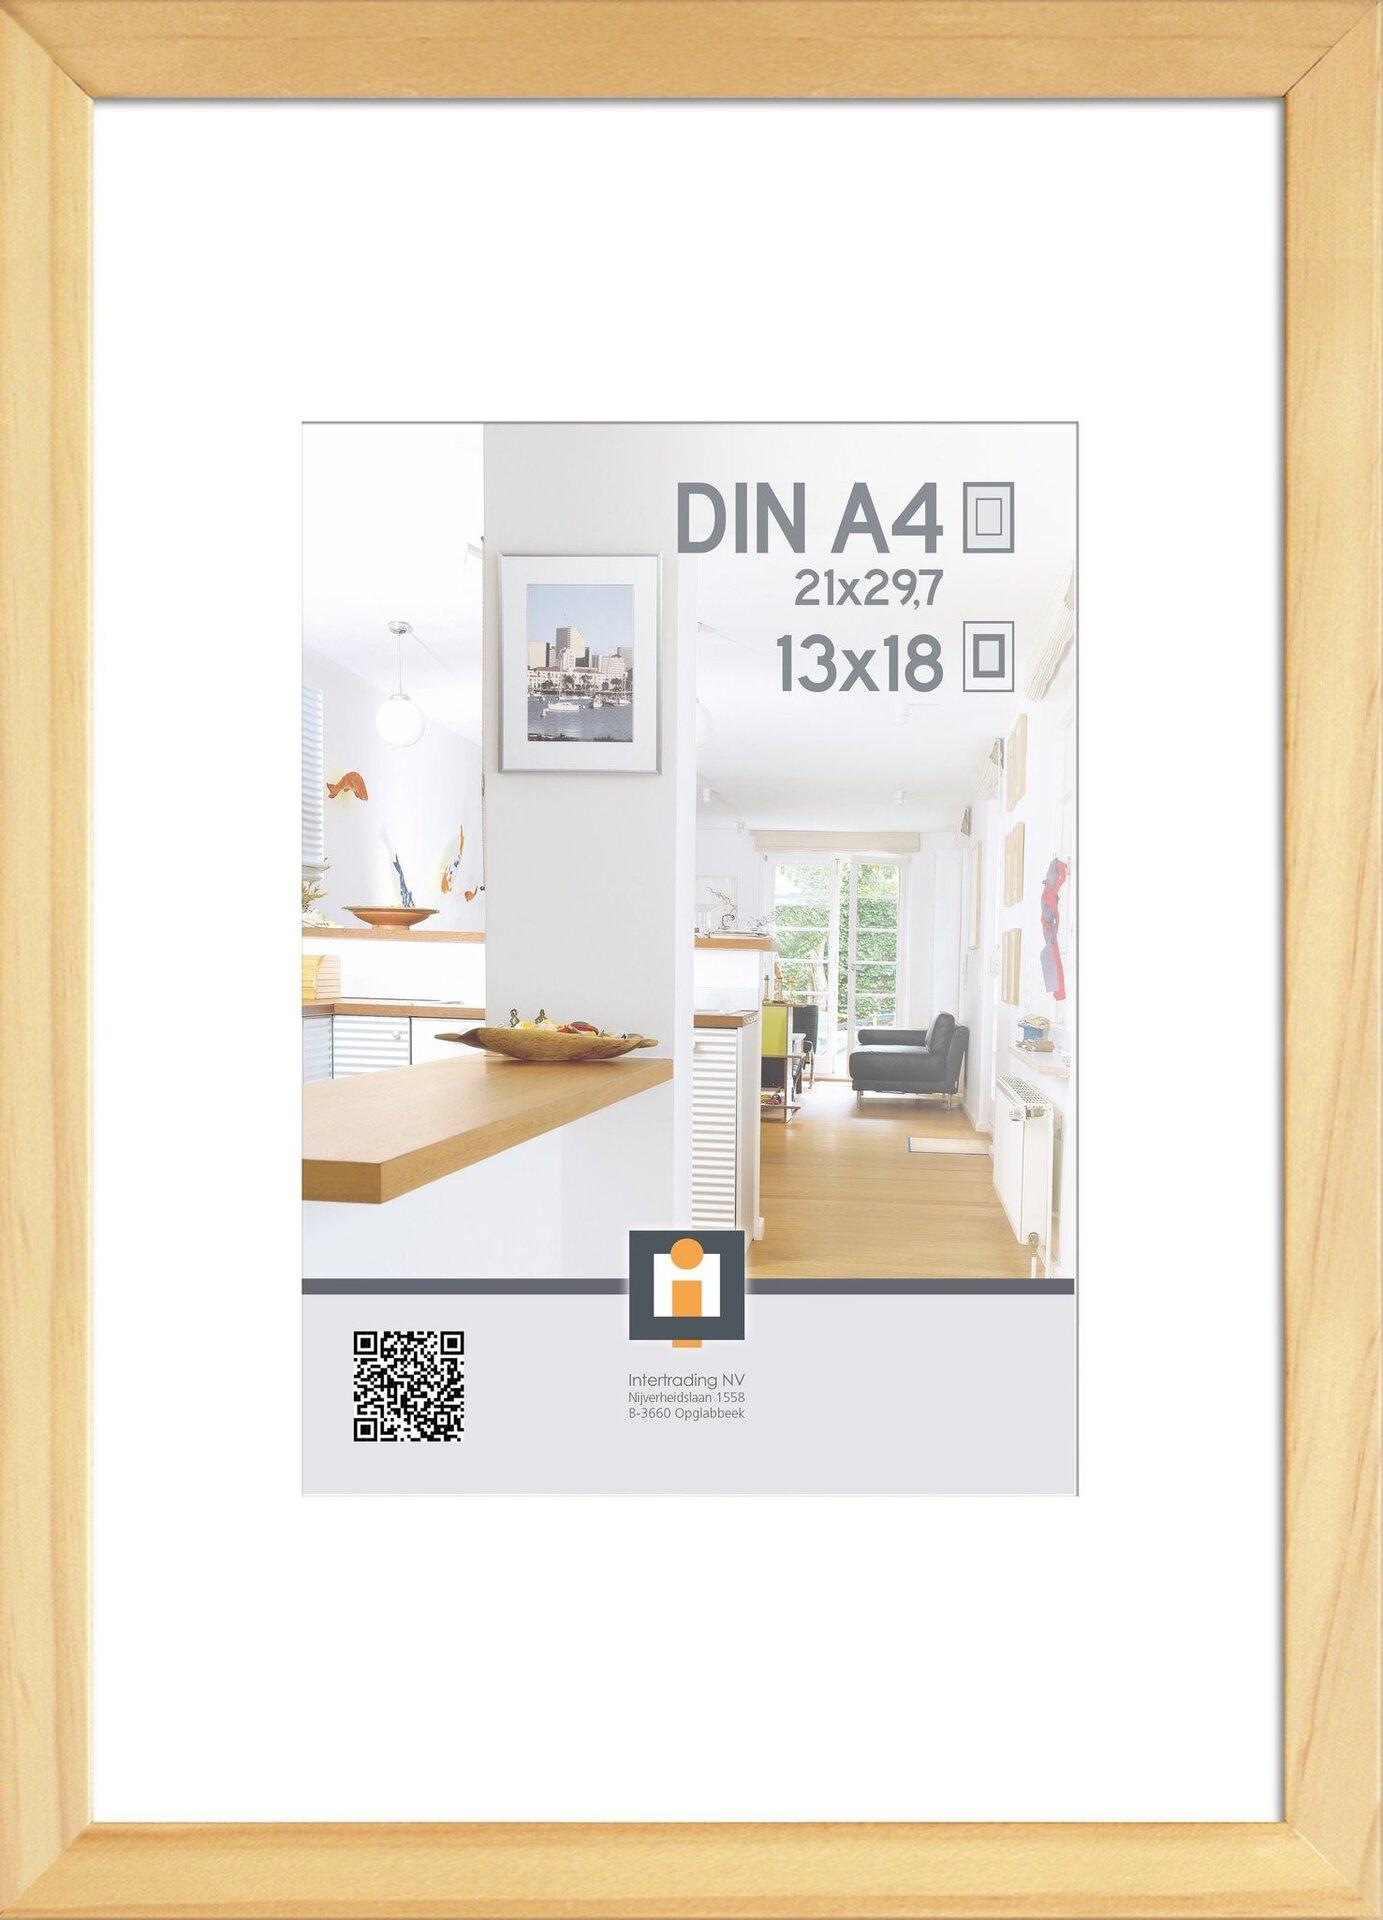 Bilderrahmen GÖTEBORG INTERTRADING Kunststoff 23 x 32 x 2 cm